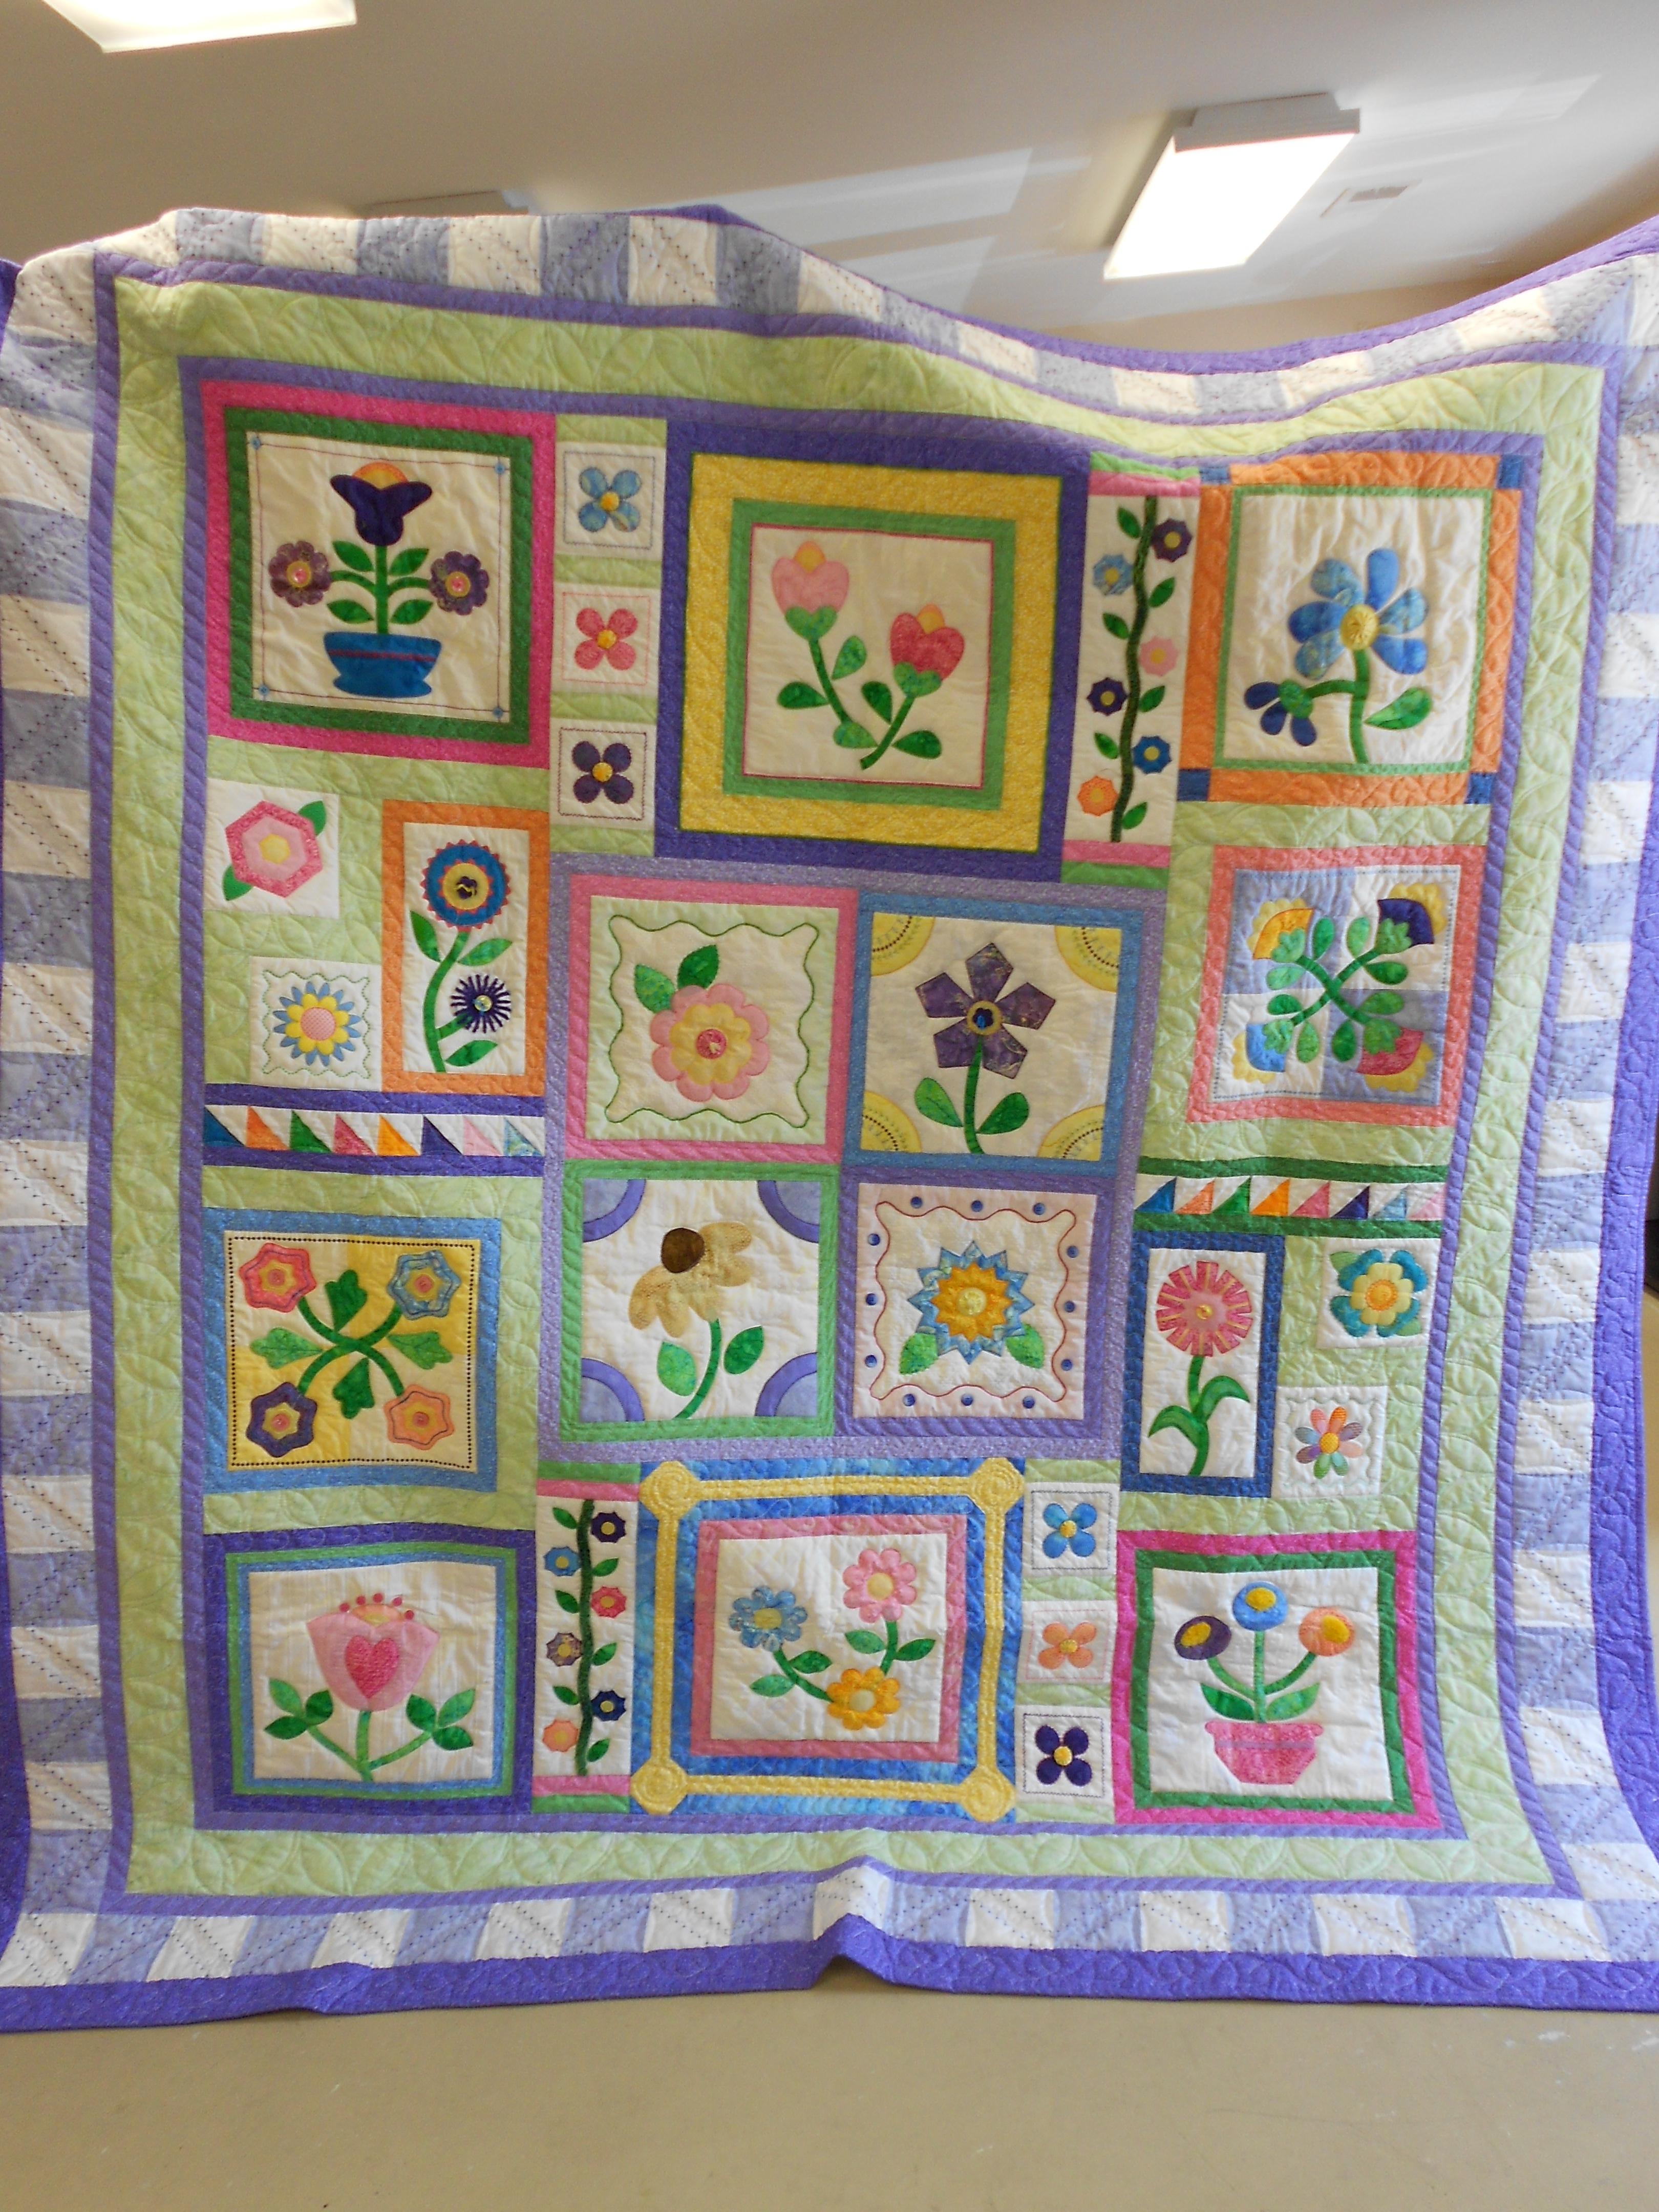 1000 Images About Stitcher 39 S Garden On Pinterest Quilt